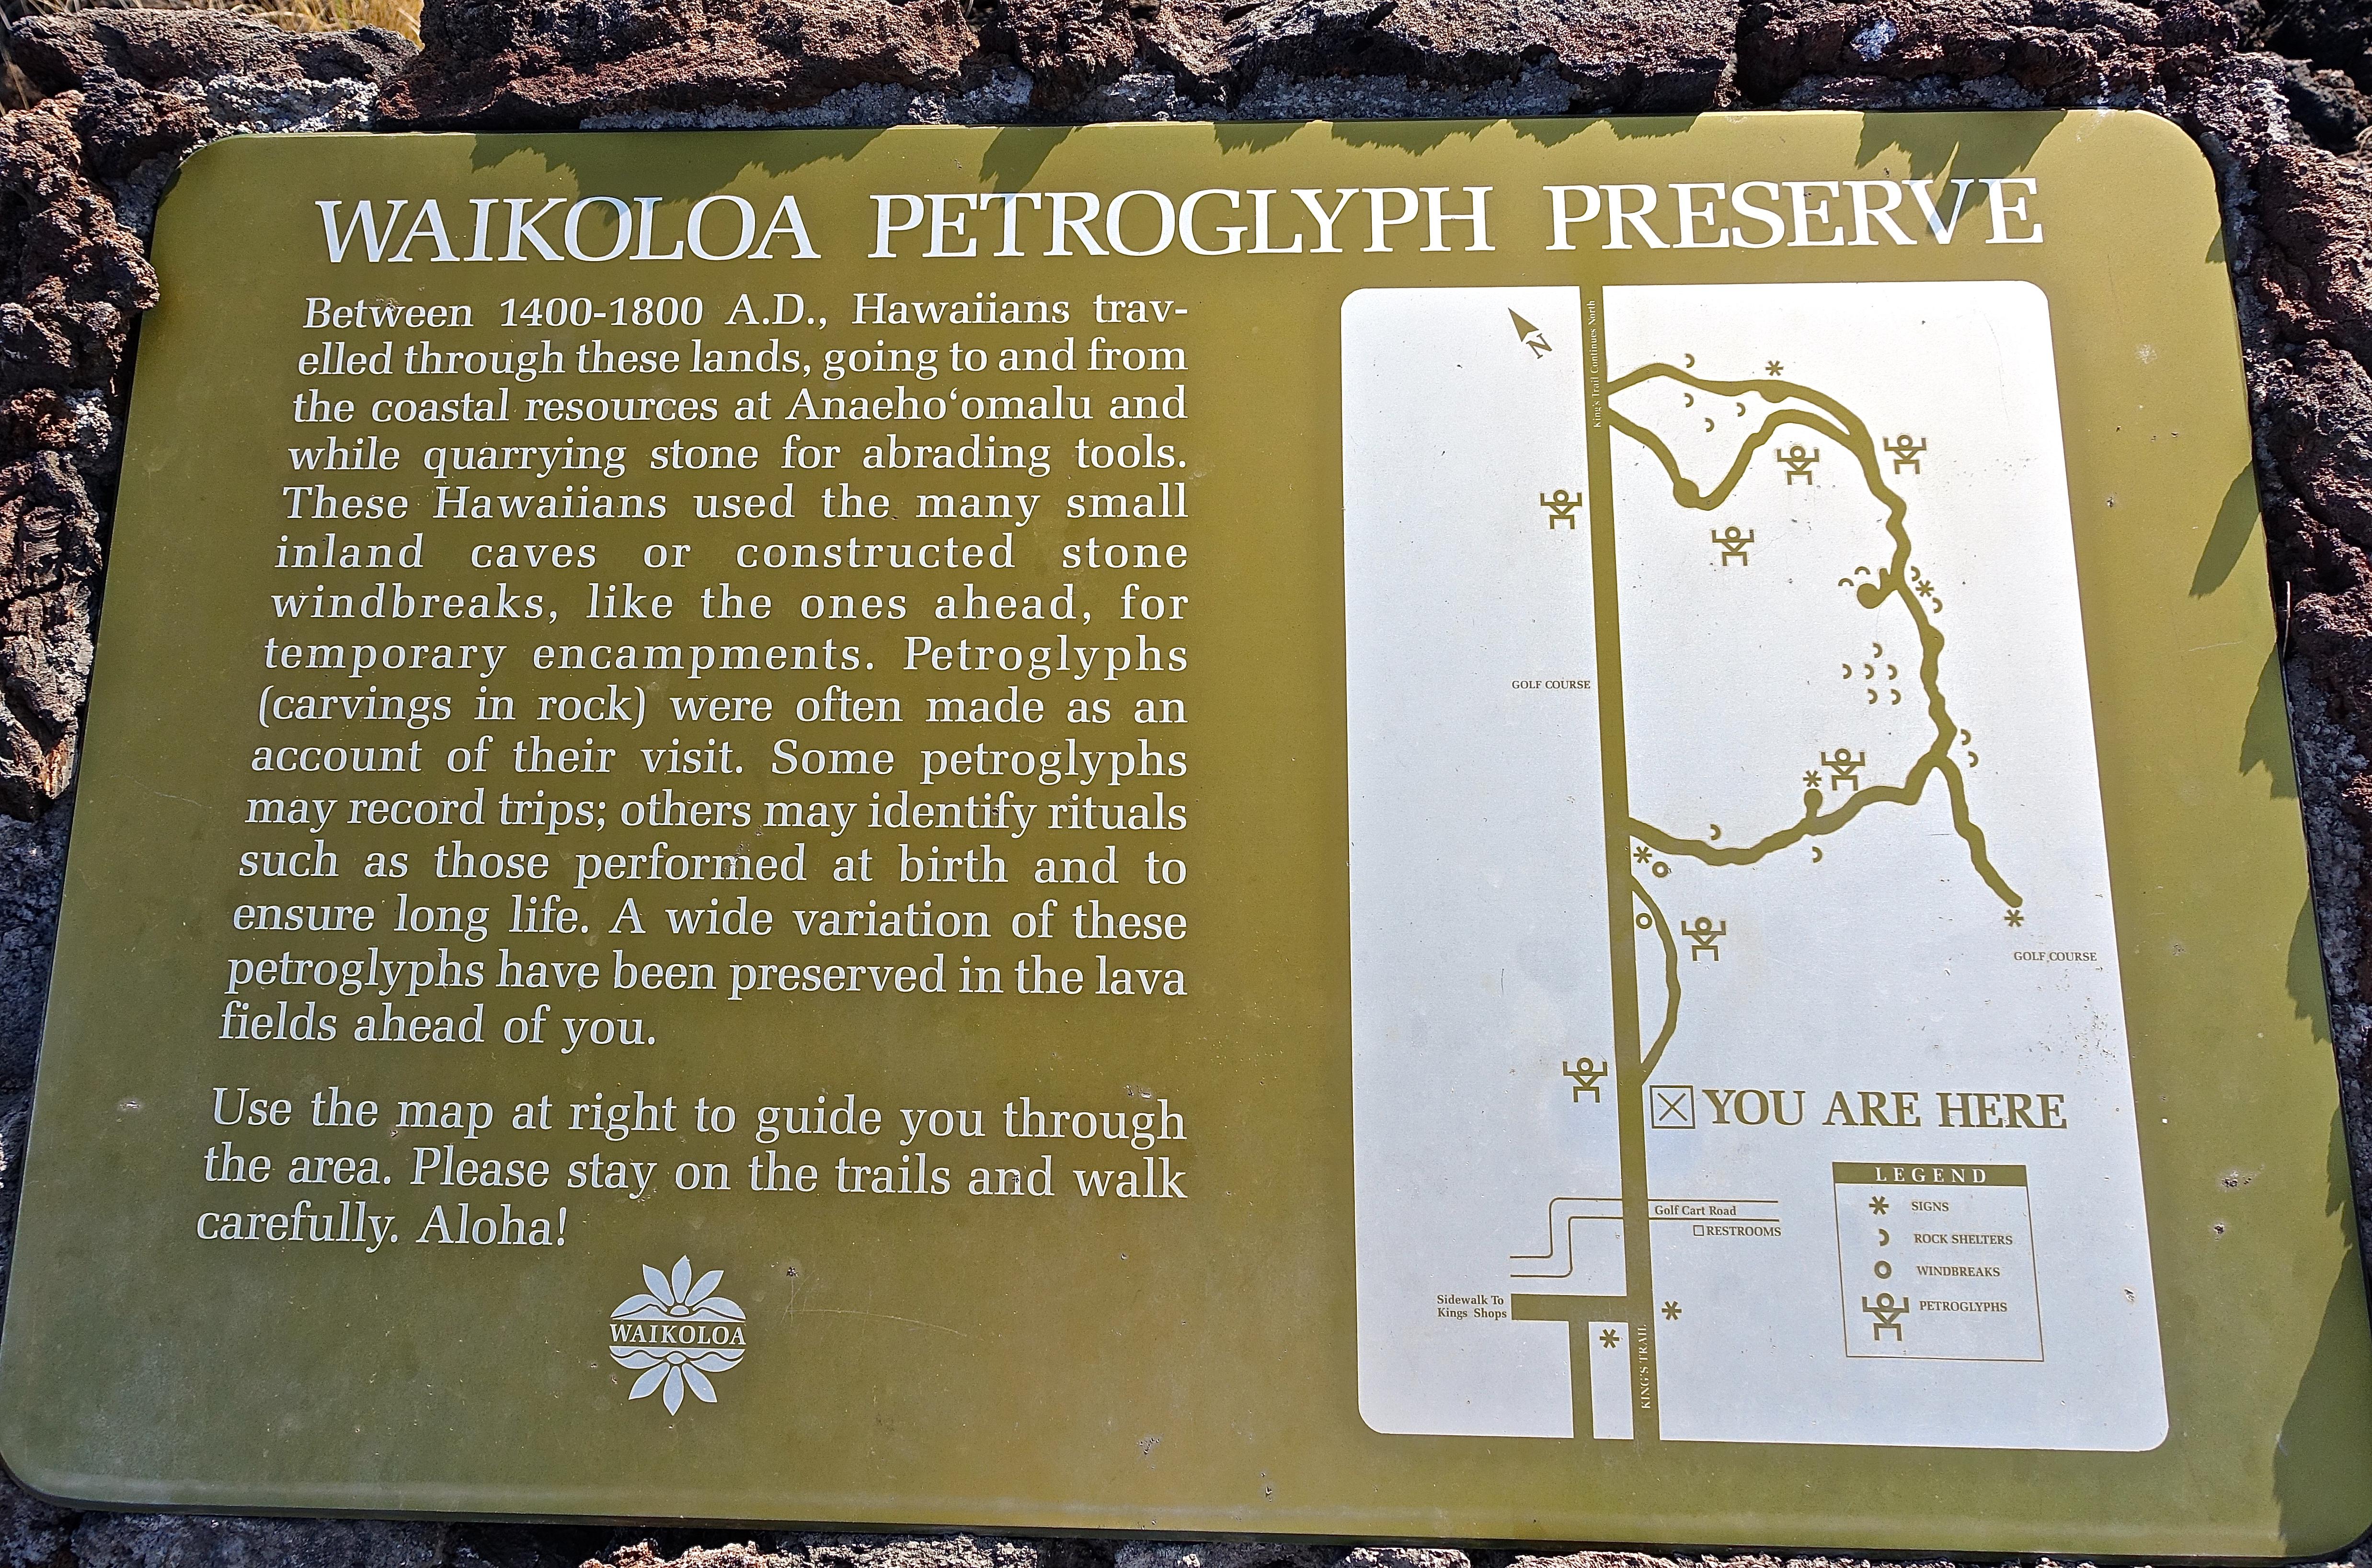 Waikoloa Petroglyph Preserve